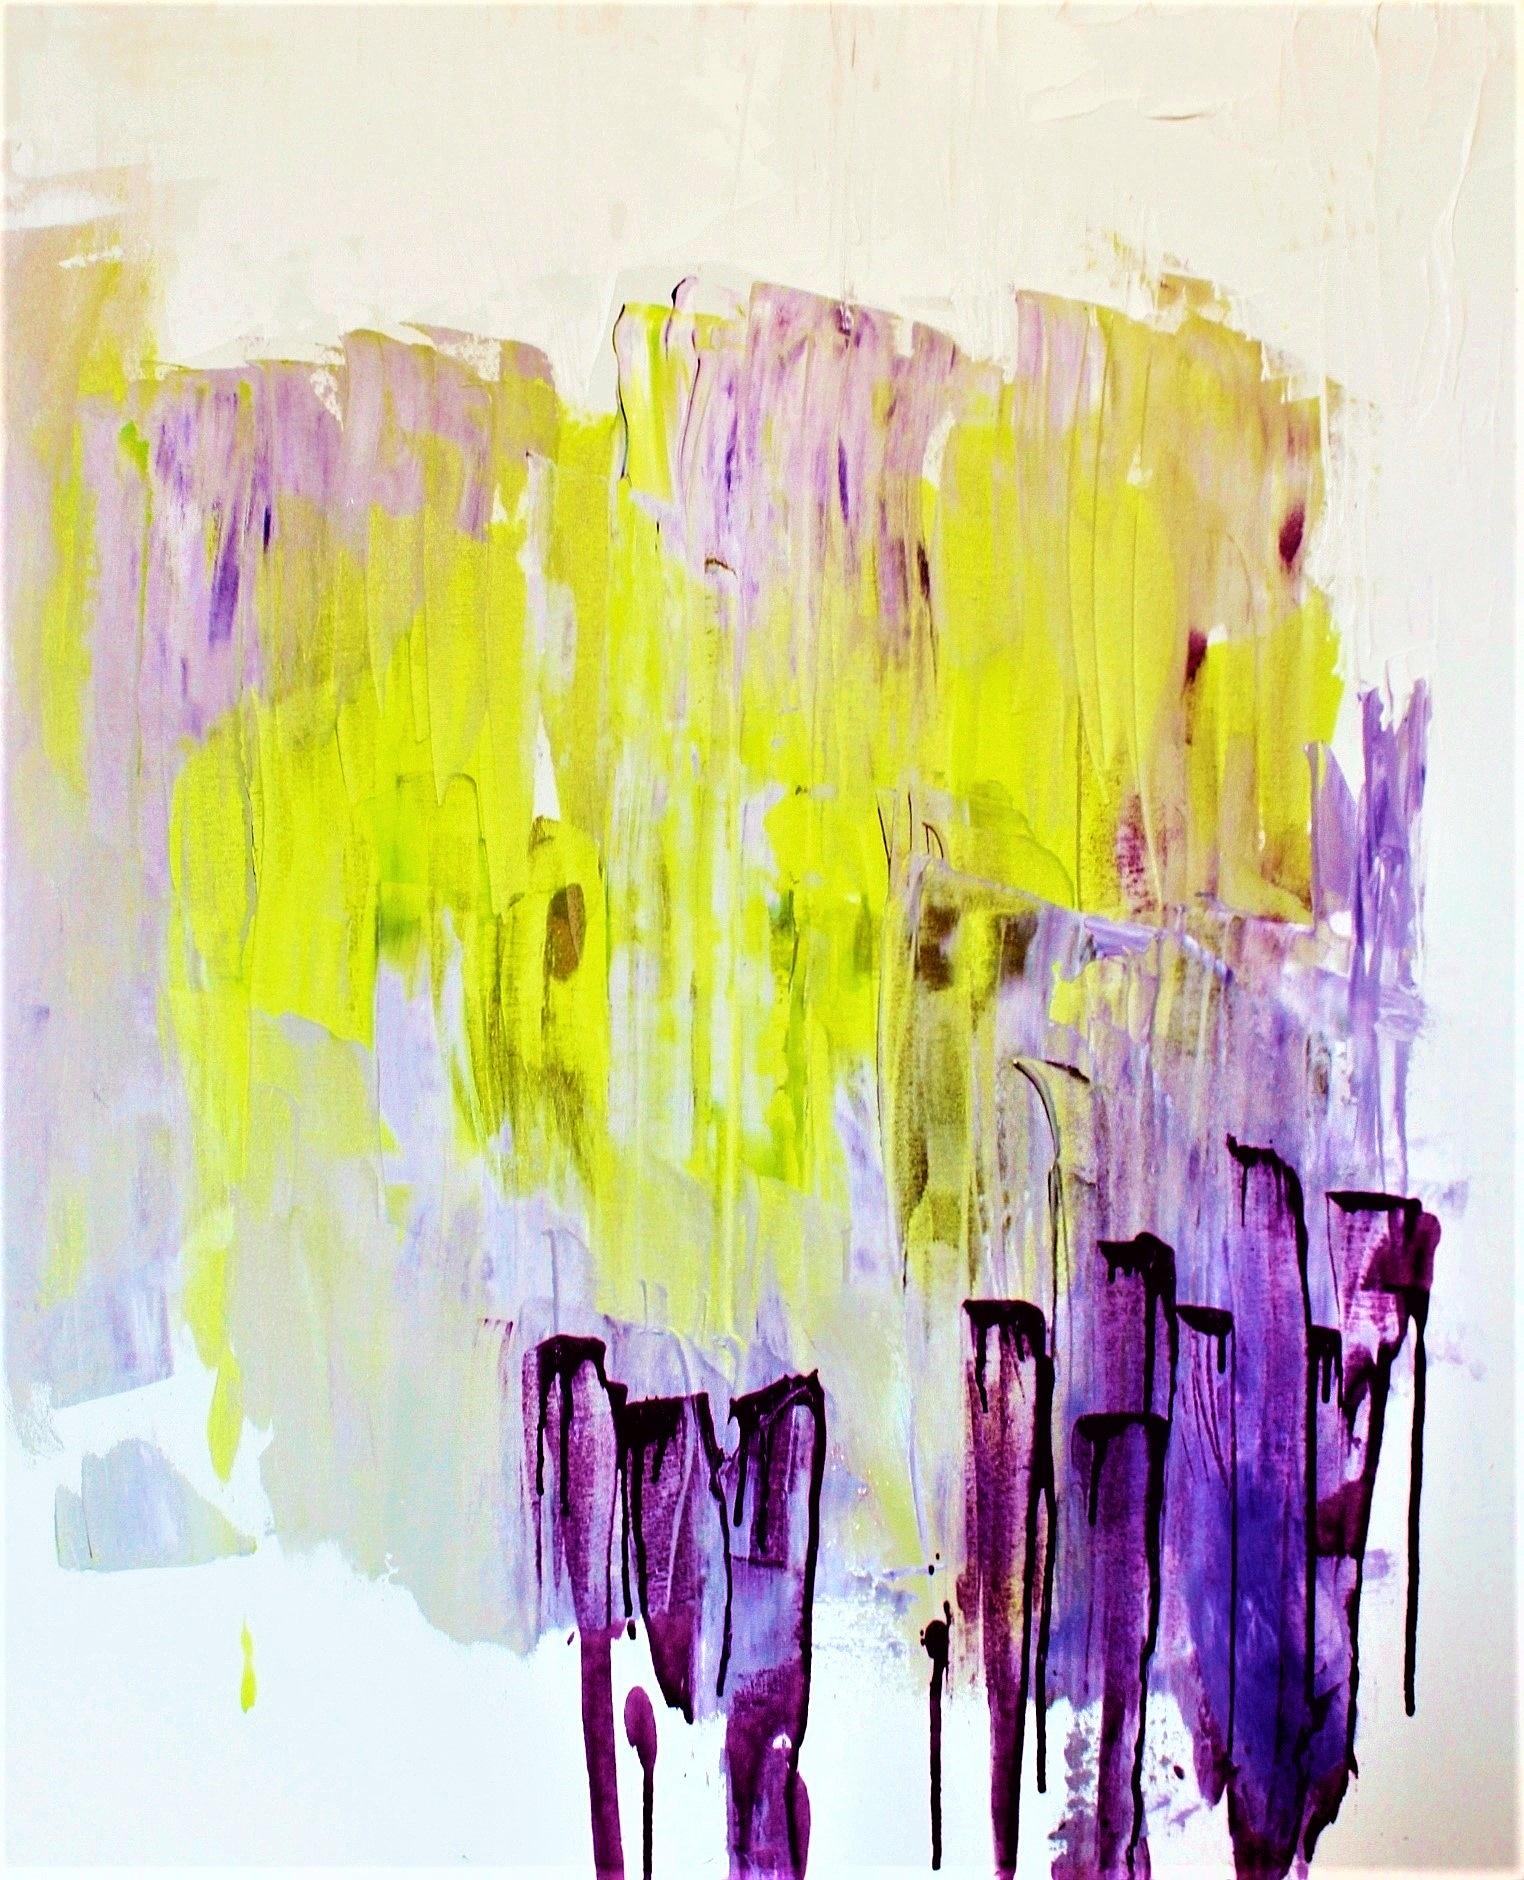 Kirkkaat ajat, Akryyli kankaalle, 100 cm x 80 cm  Myyty / Sold